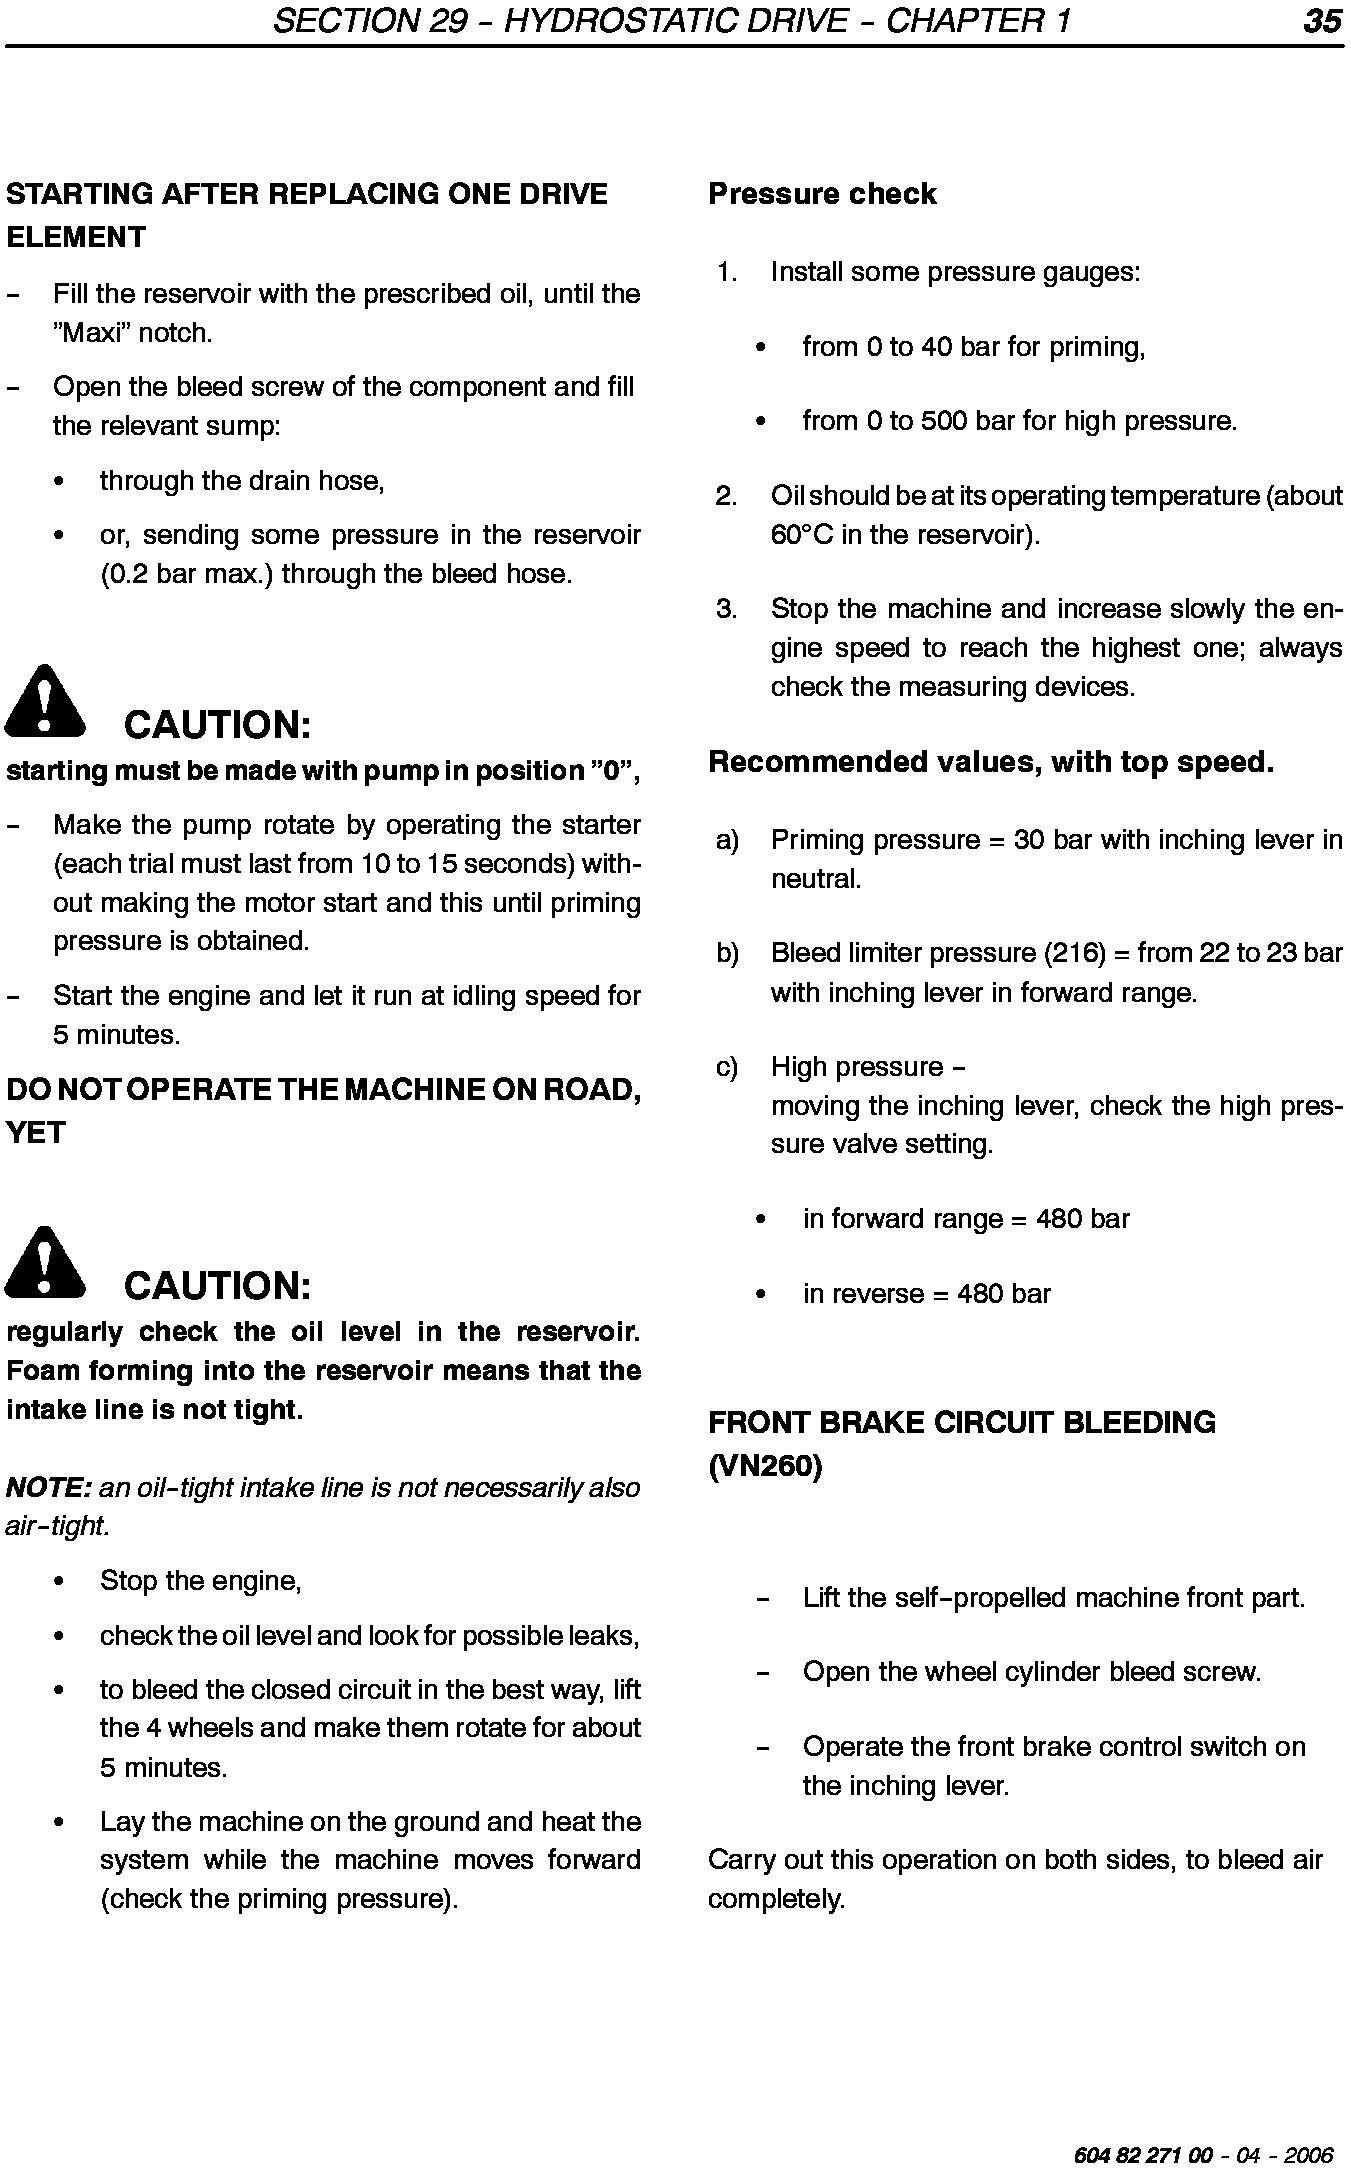 New Holland VN240, VN260 Grape Harvester Service Manual - 3